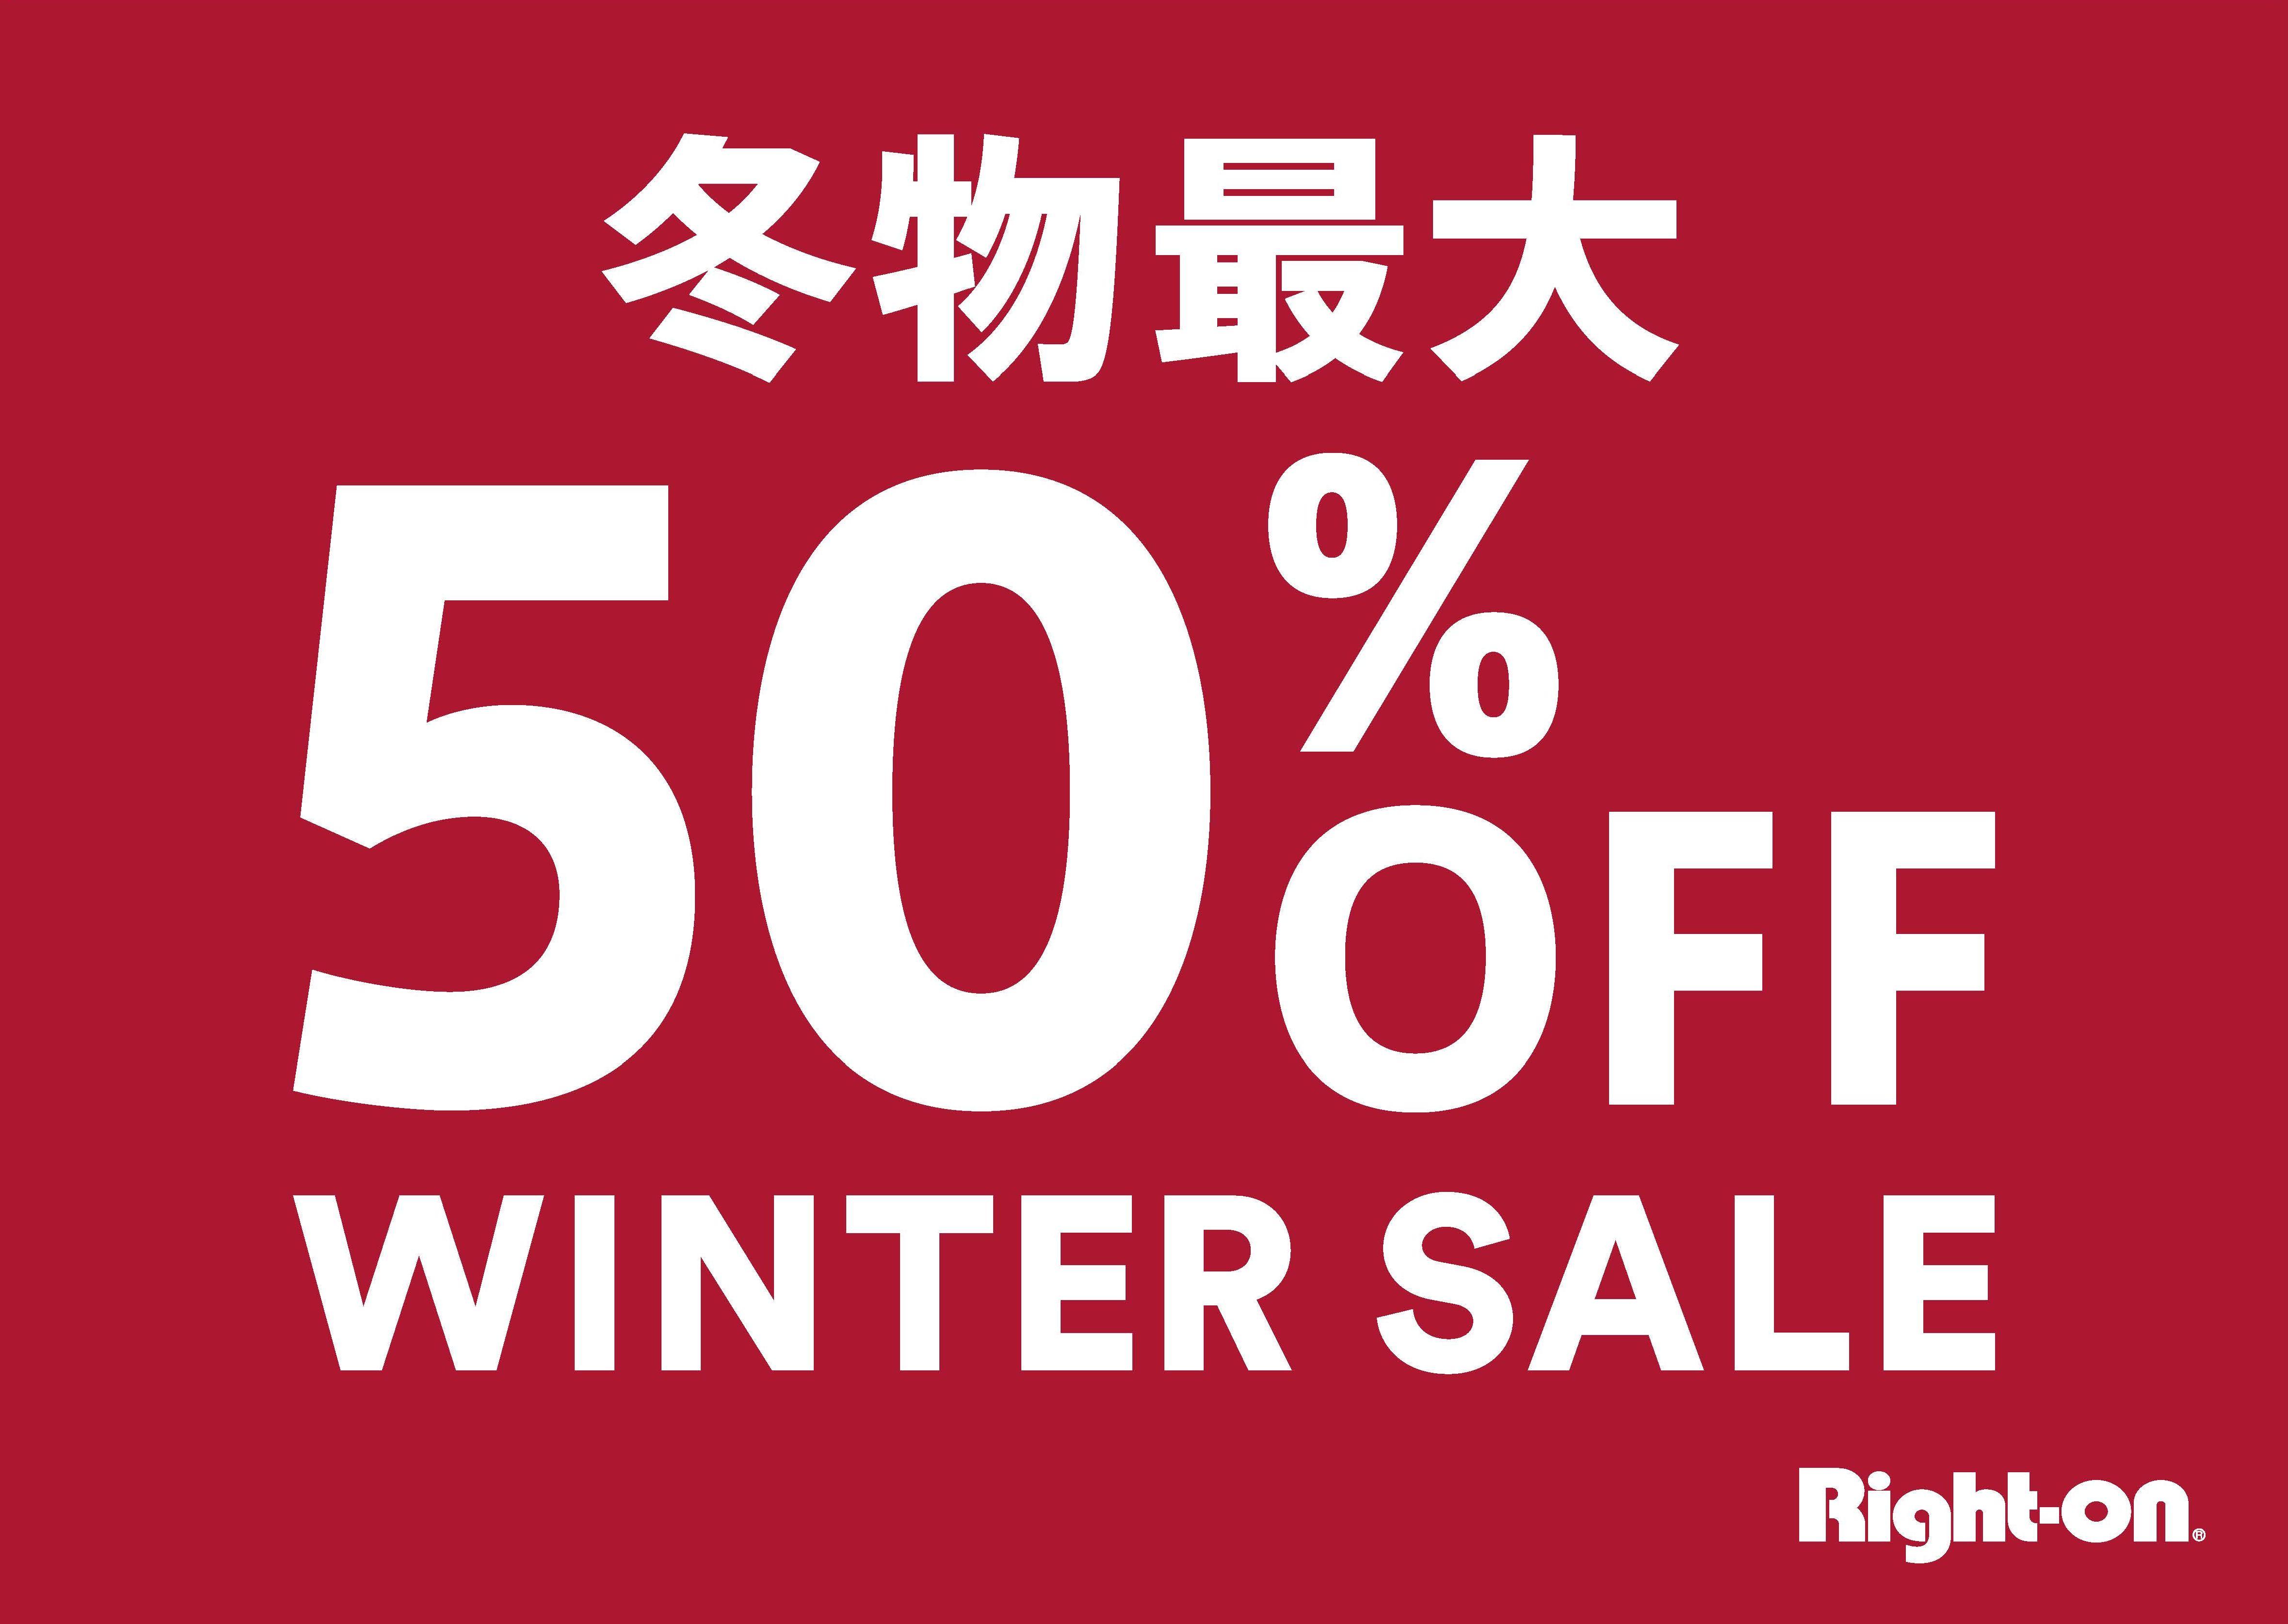 WINTER SALE!!!:イメージ